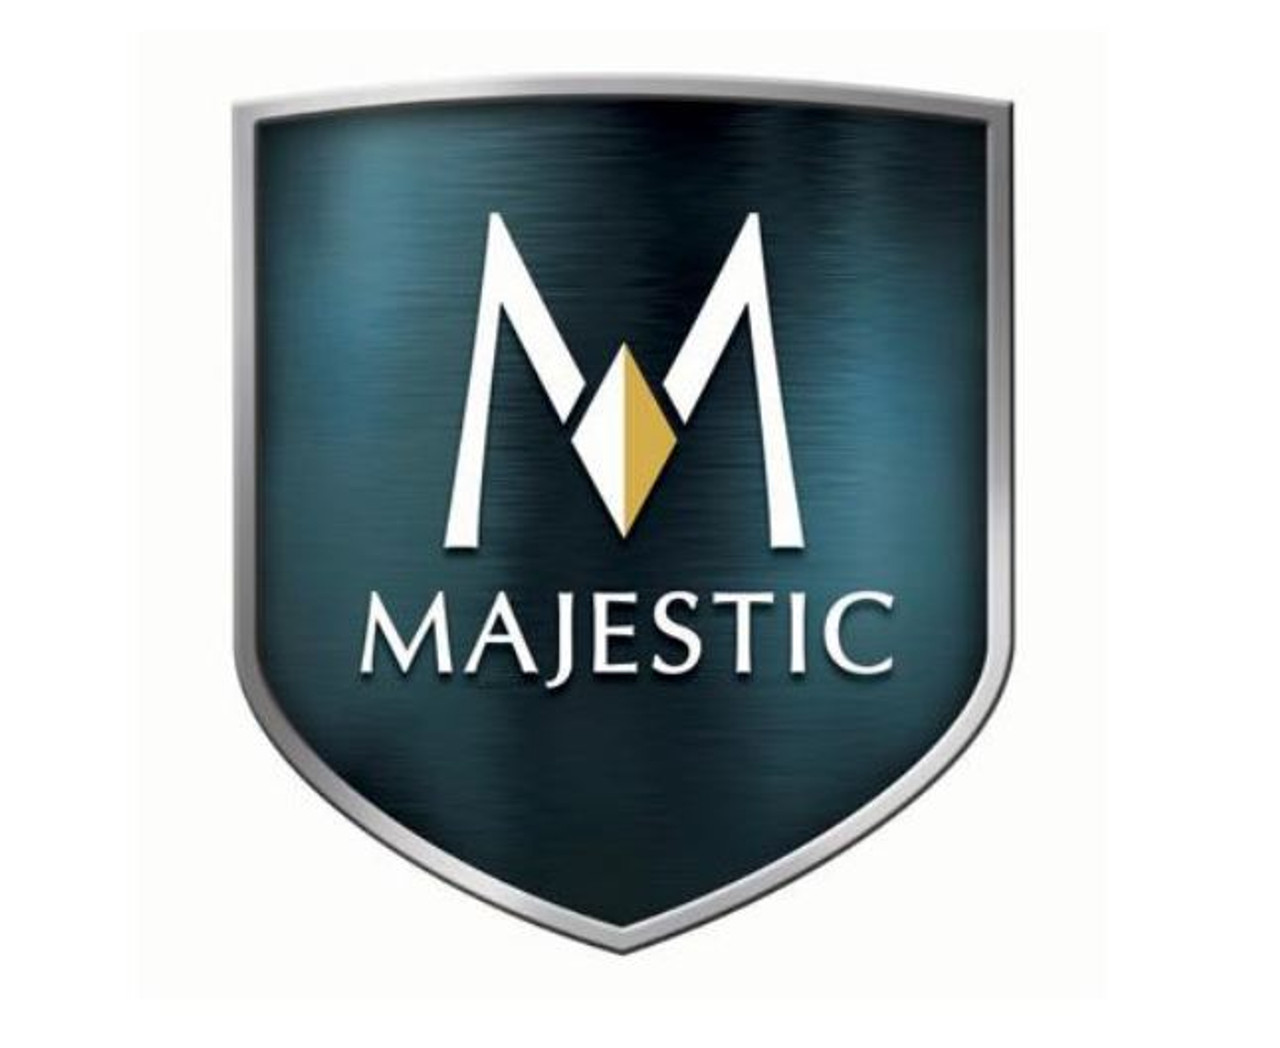 "Majestic  24"" Length Round Rigid Pipe - 6GV24 (Gas Fireplace - 6"" B-Vent)"